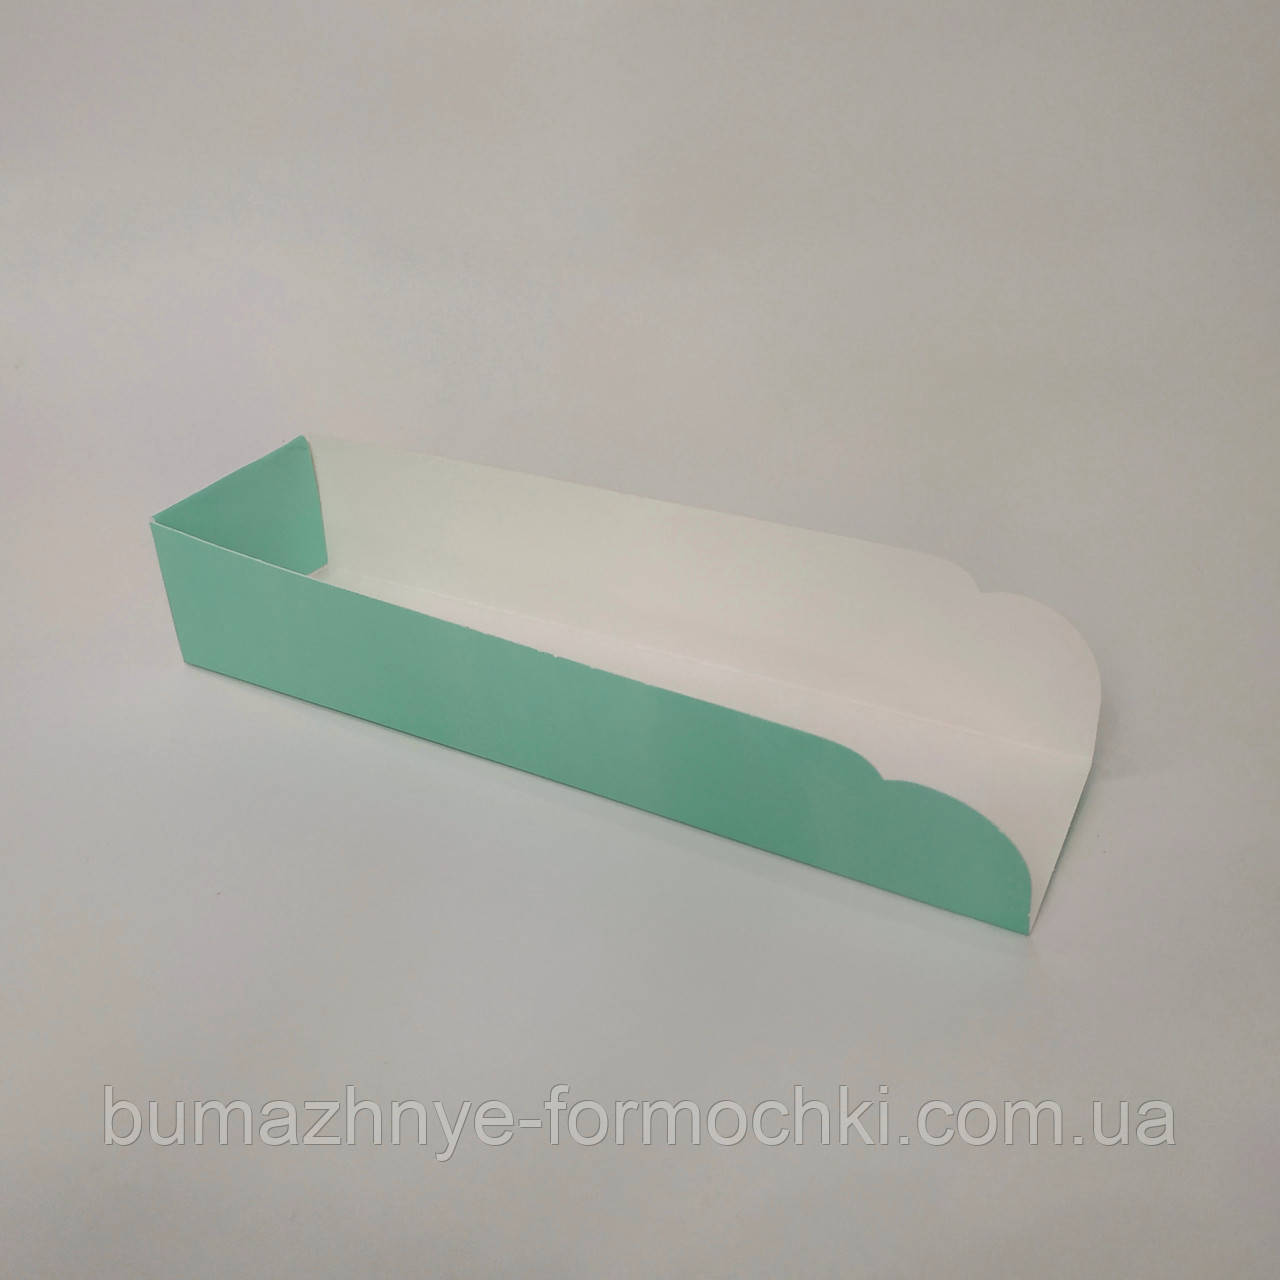 Подложка под хот-дог, цвет тиффани, 205х50х40